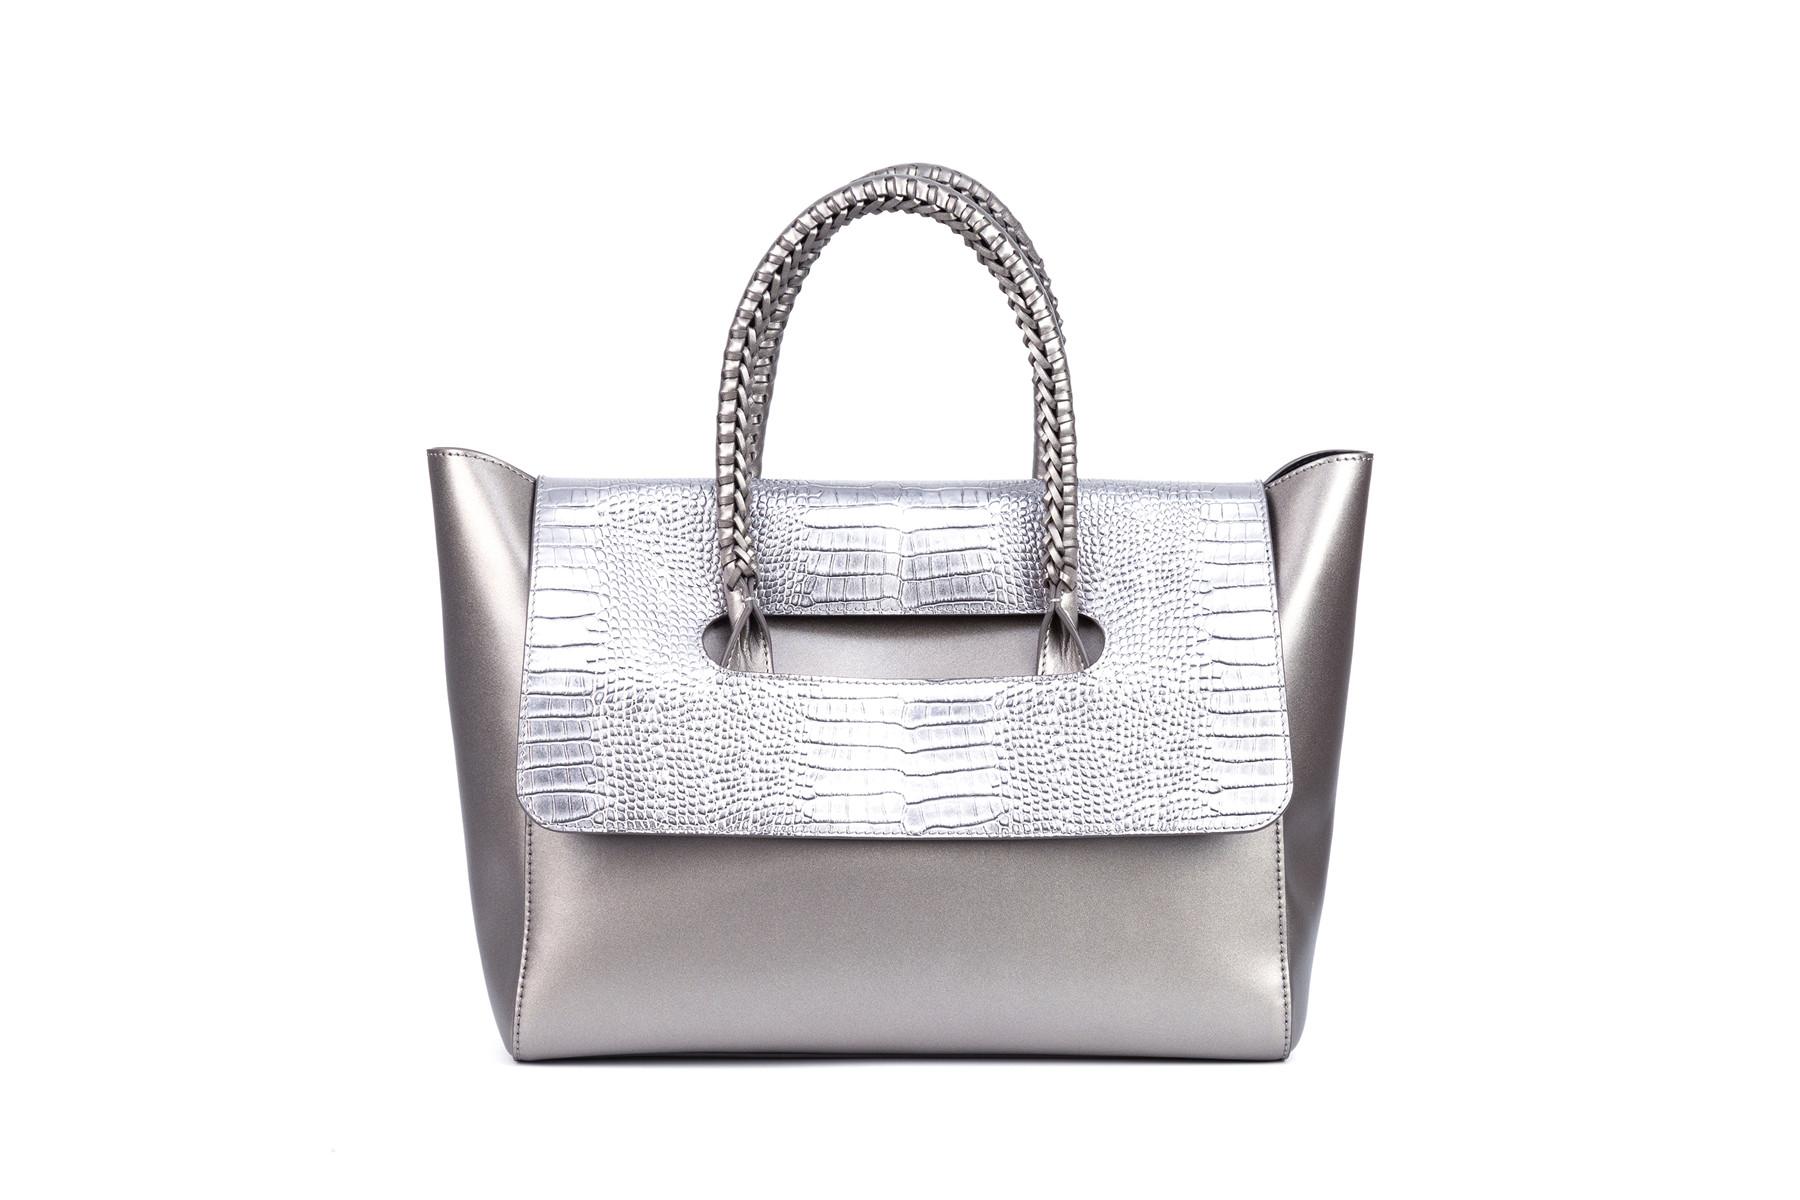 GF bags-Bulk Luxury Handbags Manufacturer, Affordable Handbags   Gf Bags-4